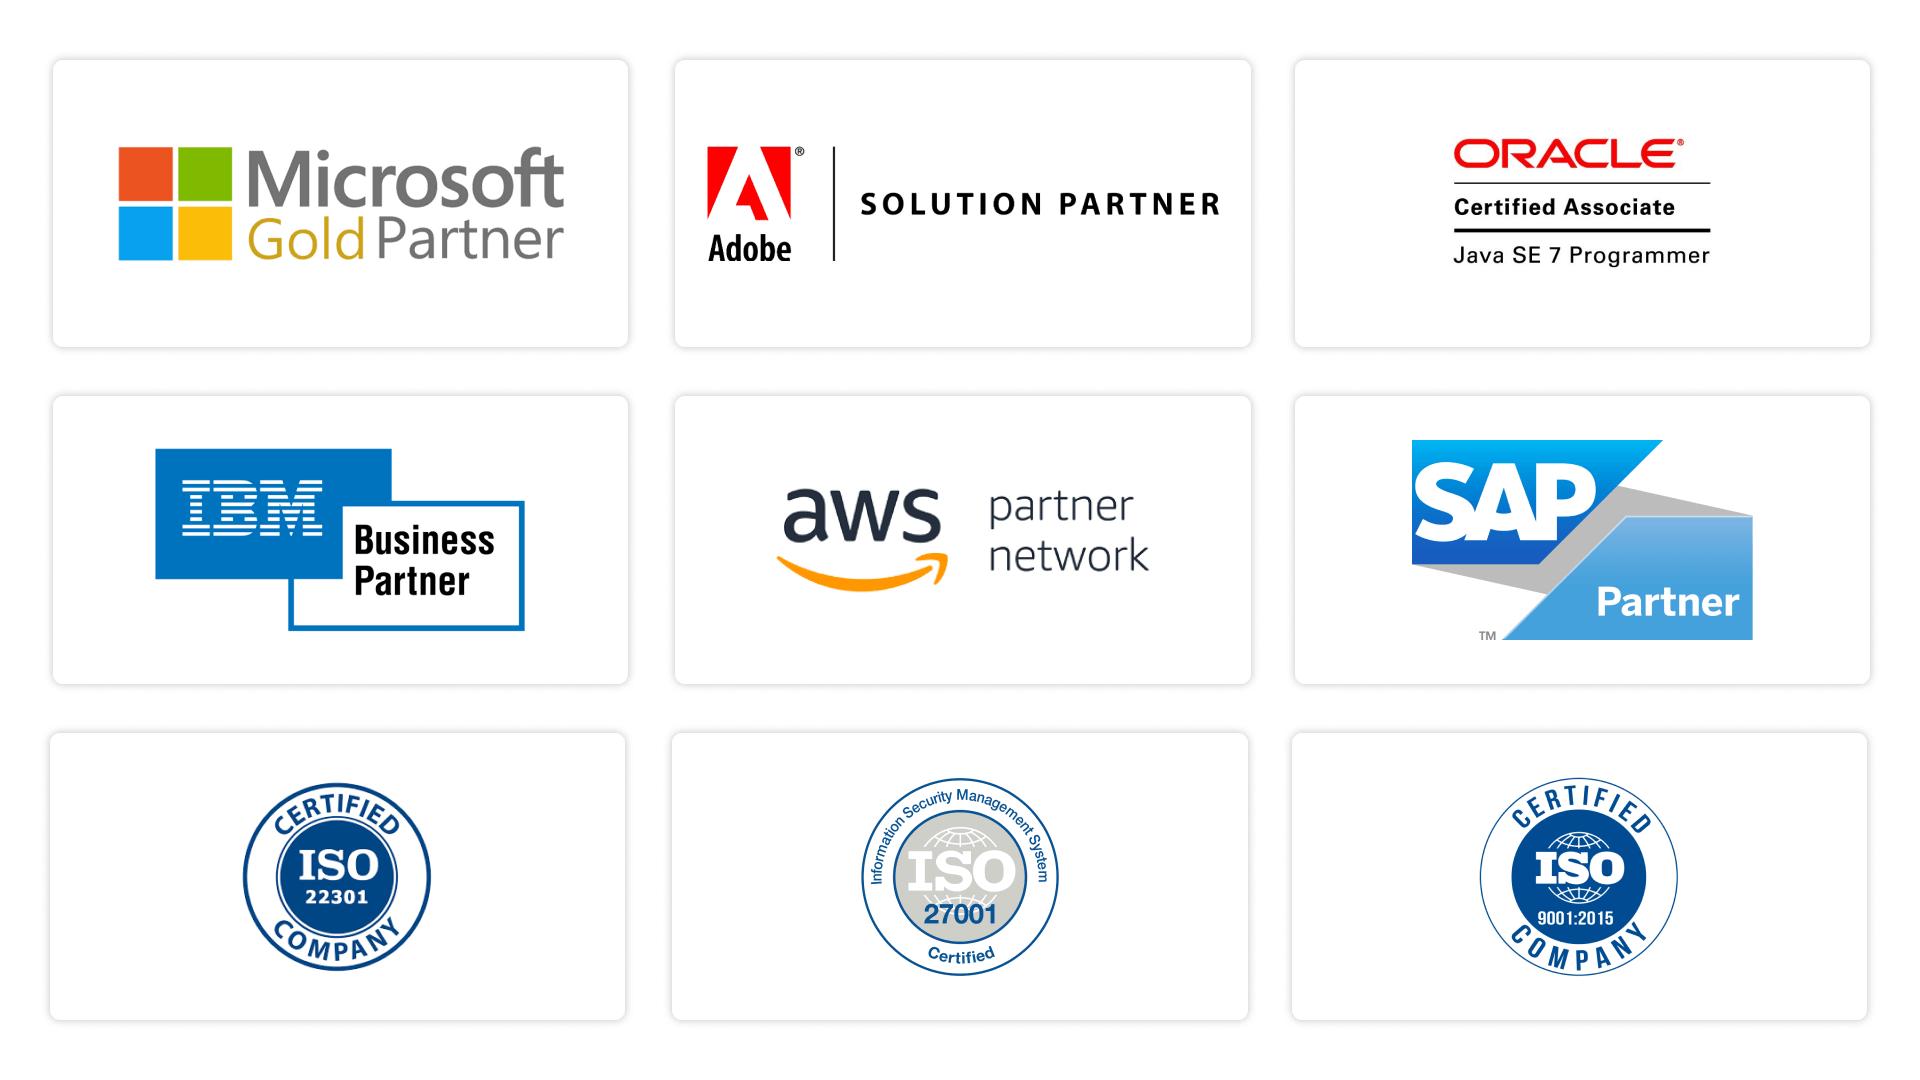 Popular certifications in IT industry